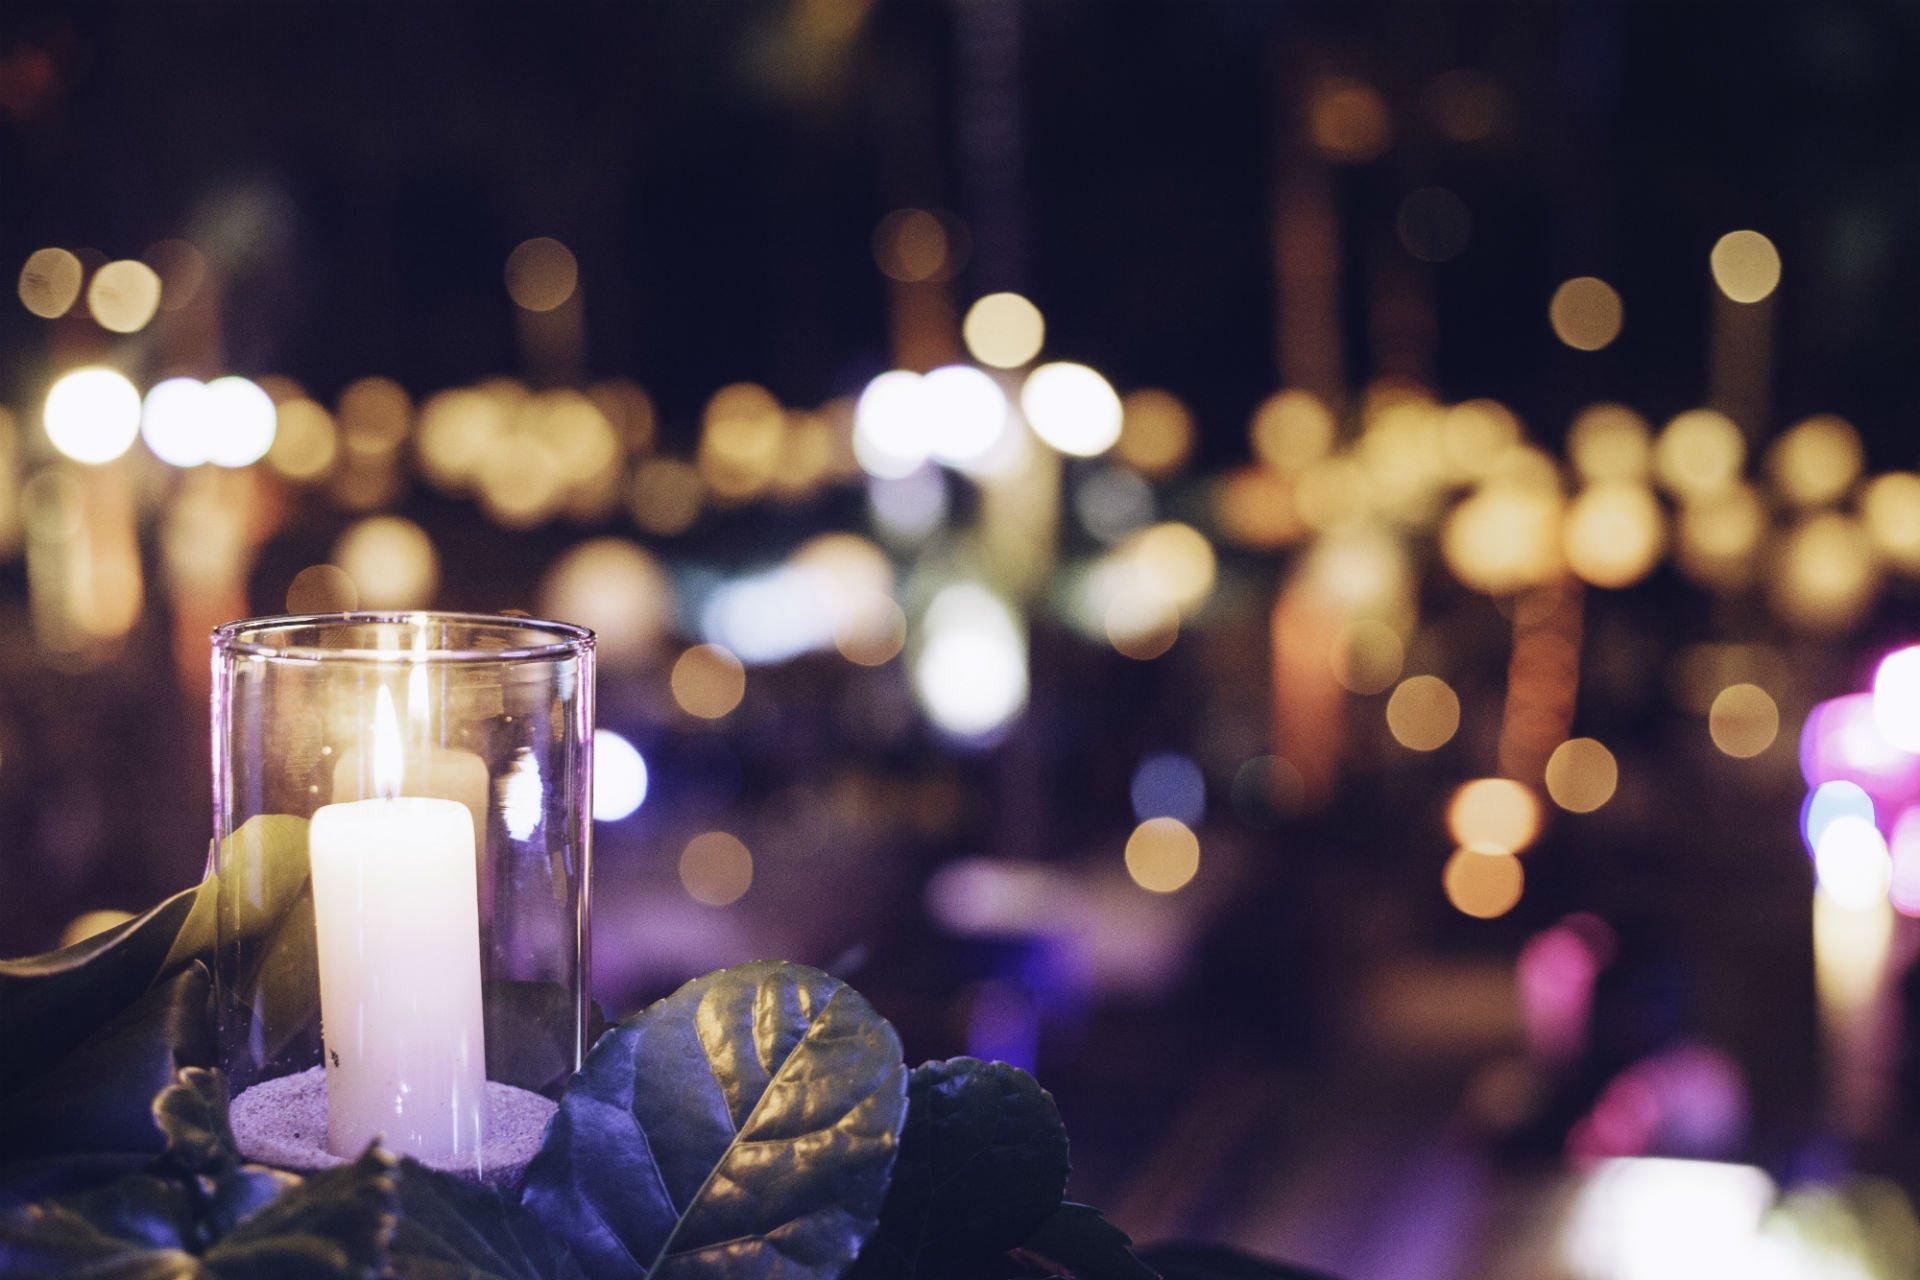 porta candela e una candela accesa